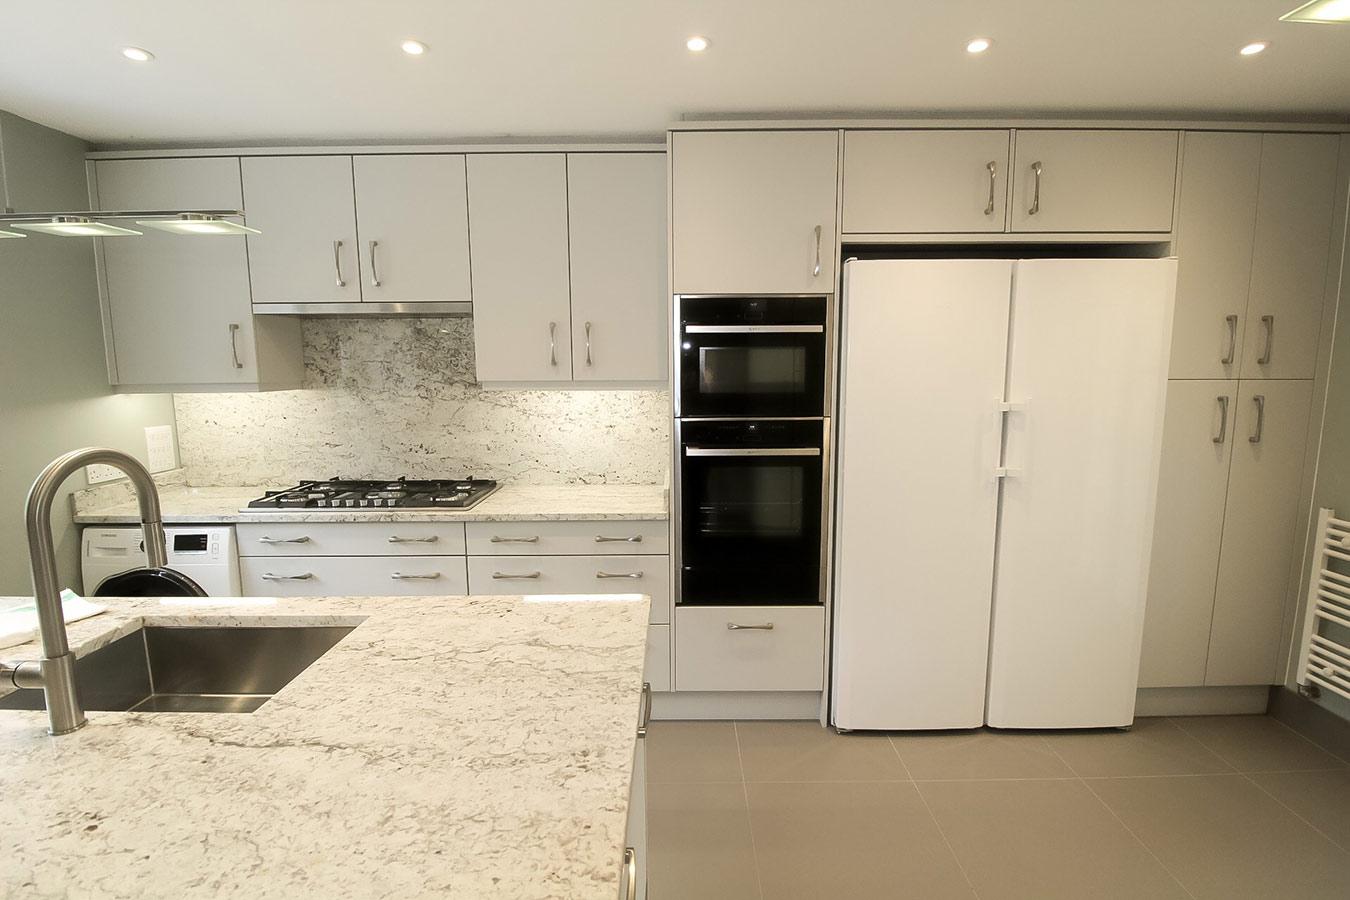 Real Kitchens | Design Inspiration | Masterclass Kitchens